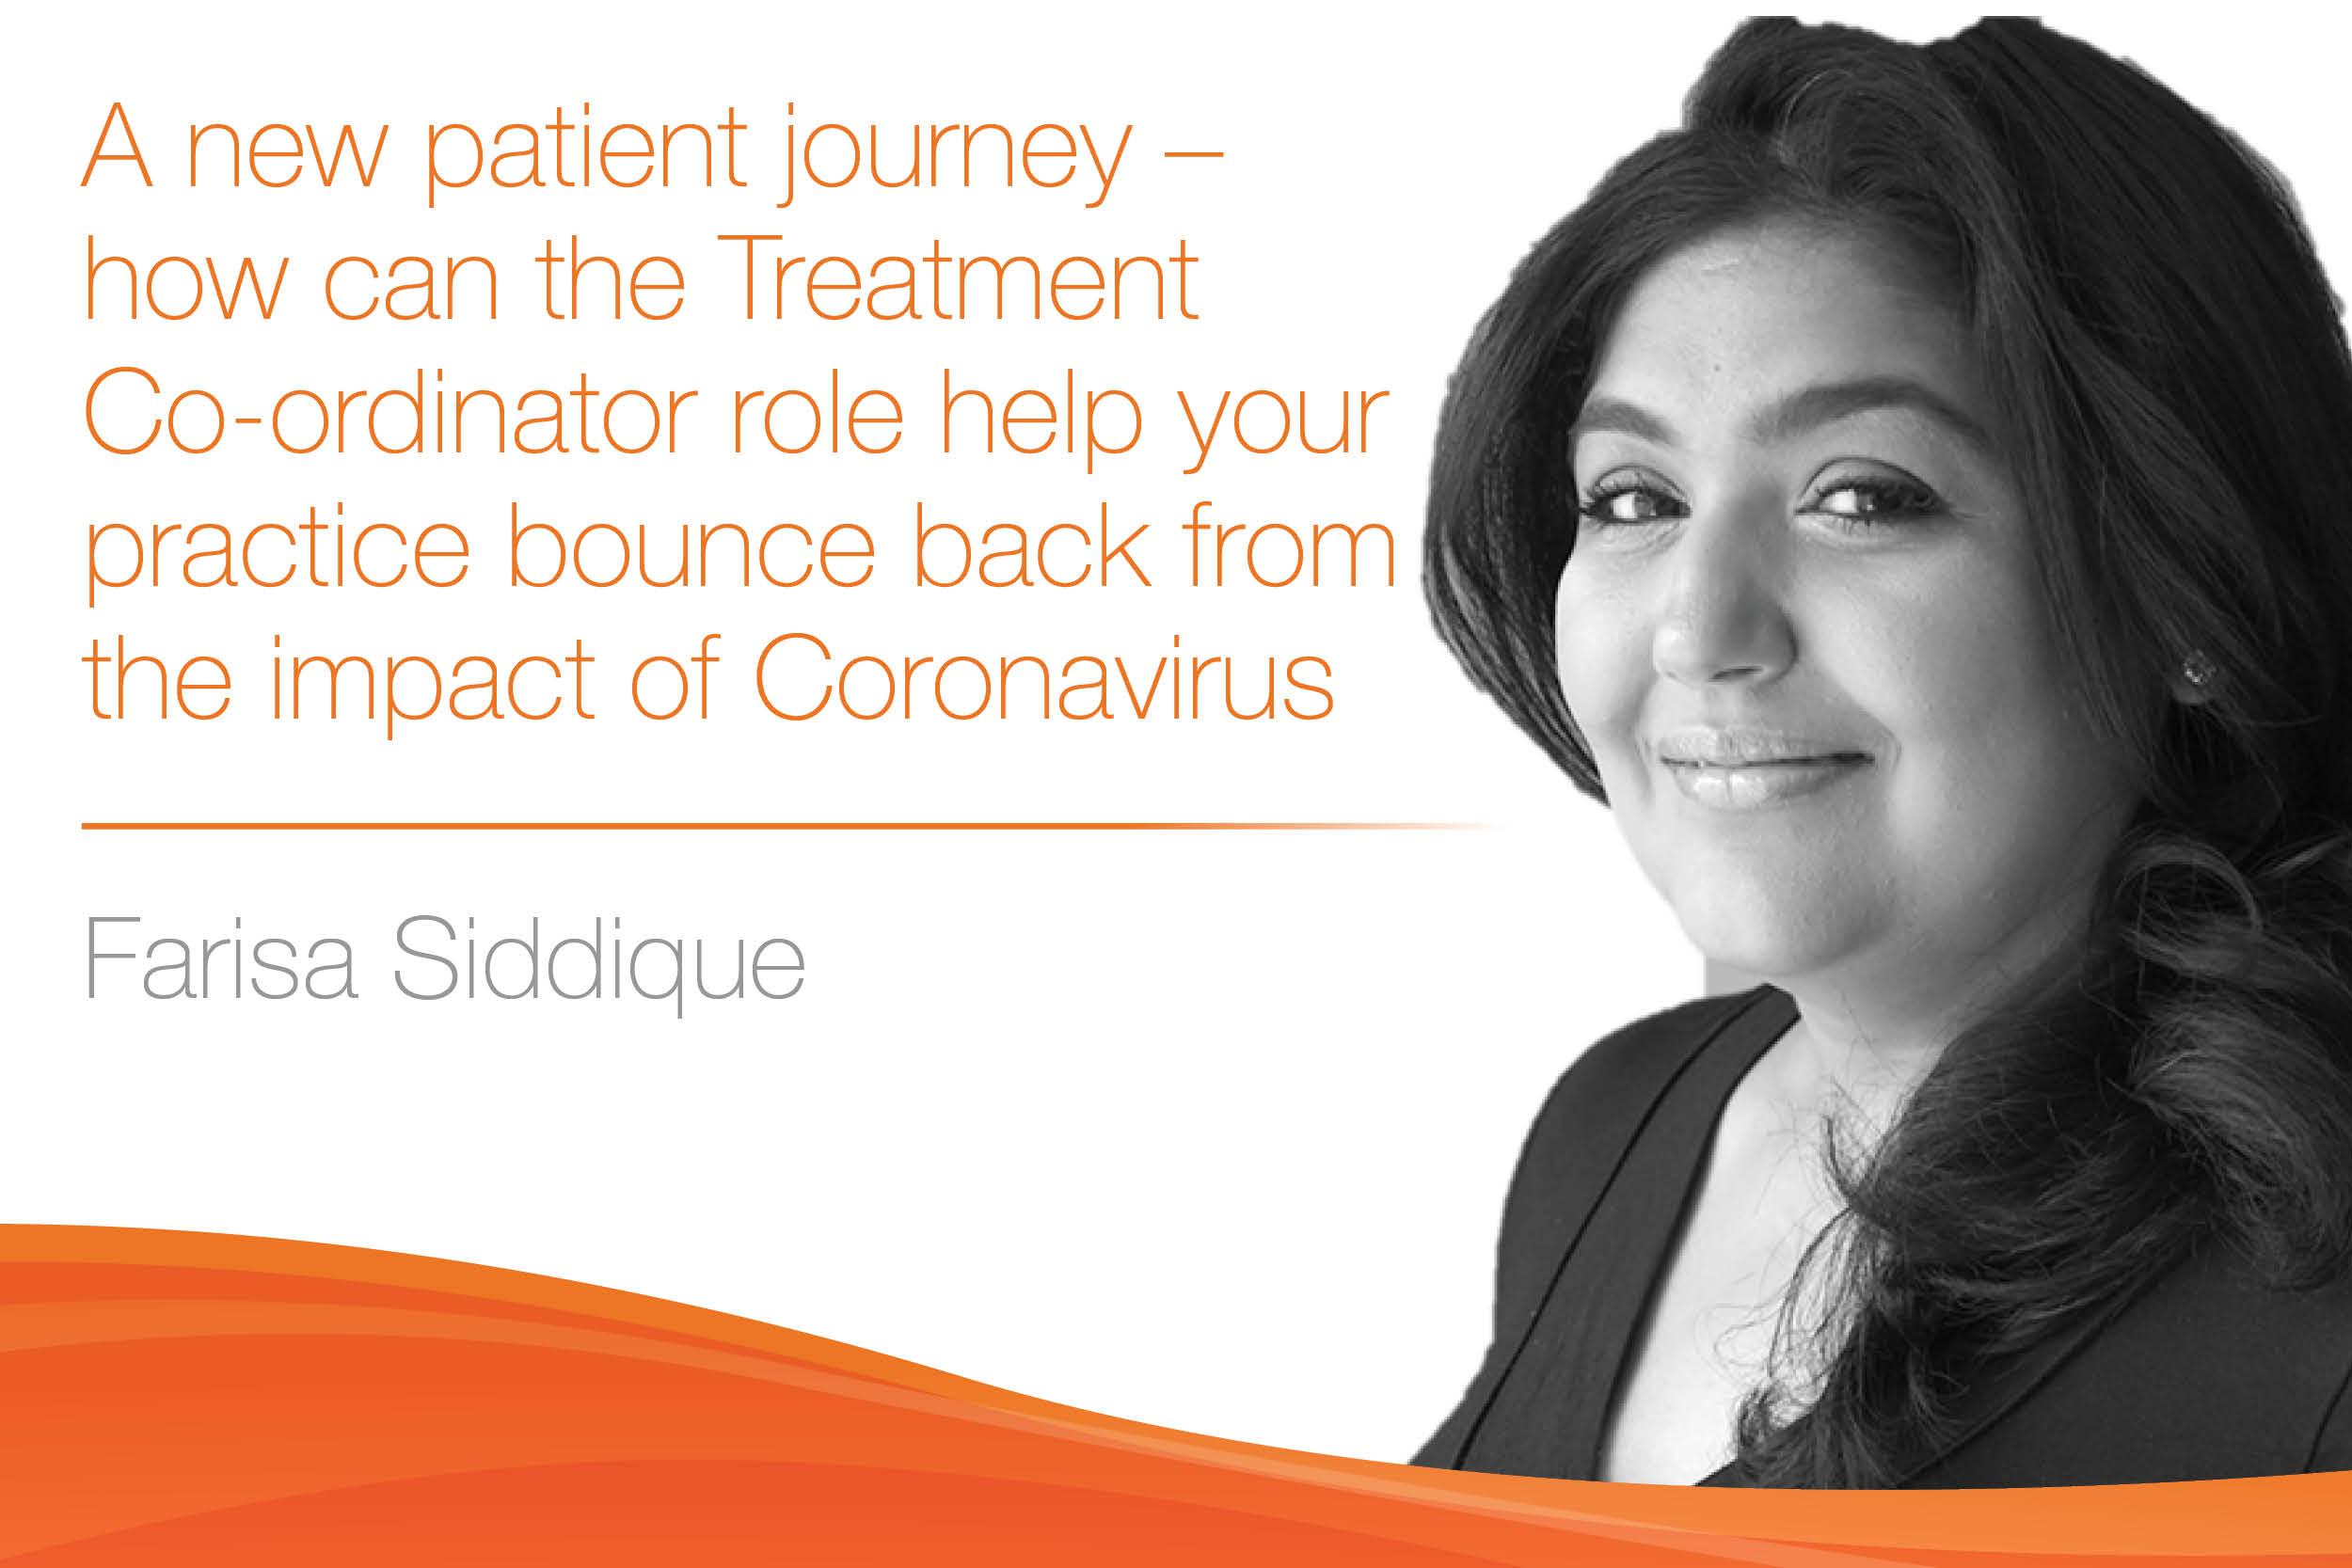 Dr. Farisa Siddique